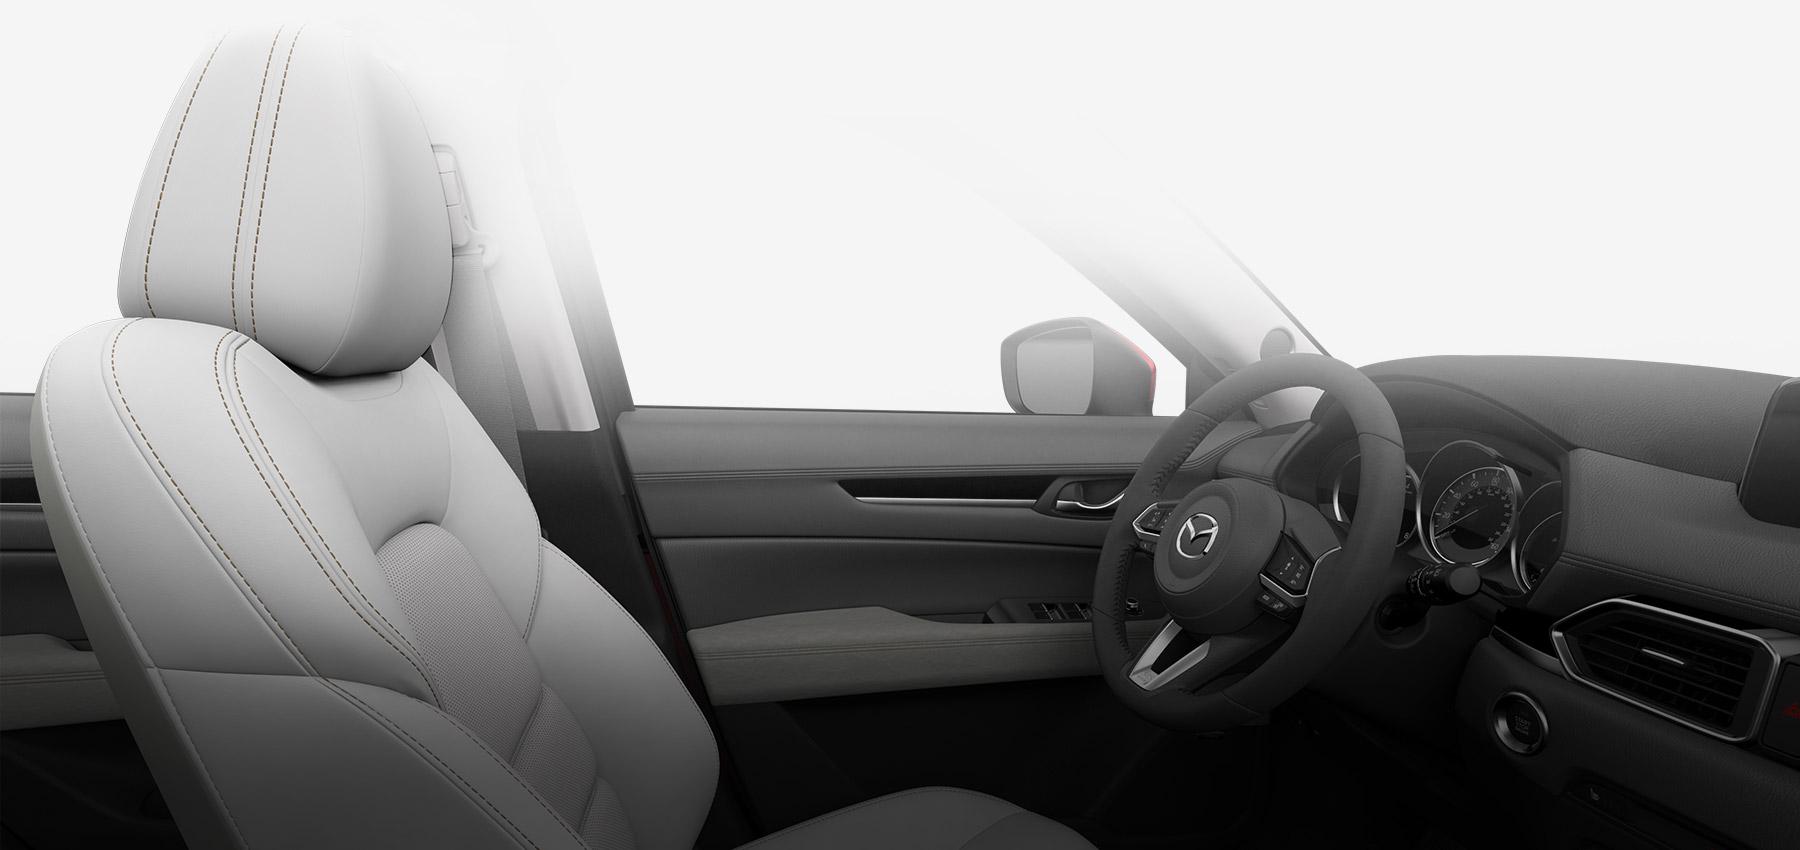 Vic Bailey Mazda >> 2017-mazda-cx5-parchment-leather_o - Vic Bailey Mazda